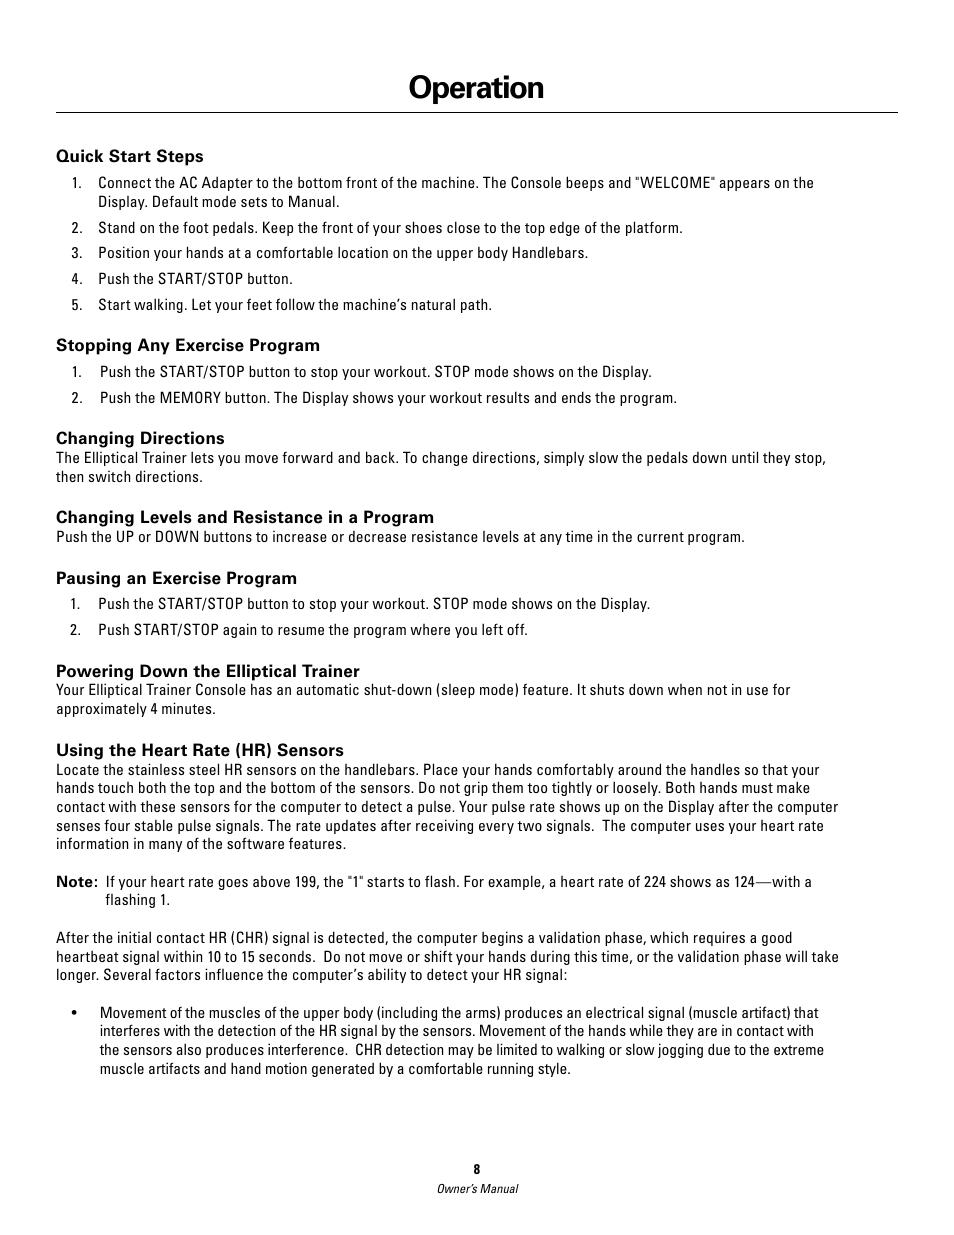 operation schwinn 420 user manual page 8 24 rh manualsdir com Schwinn 430 Elliptical Manual PDF Schwinn 420 Elliptical